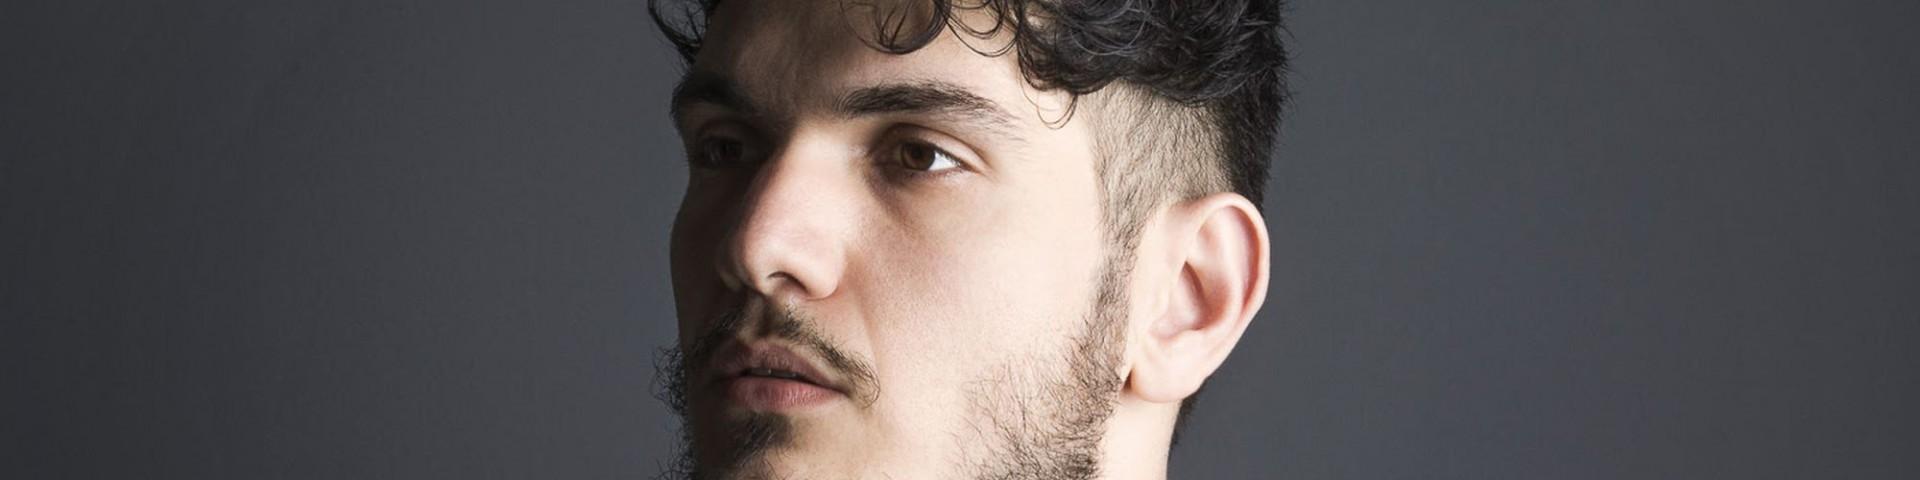 Gaudiano vince Sanremo 2021 nelle Nuove Proposte